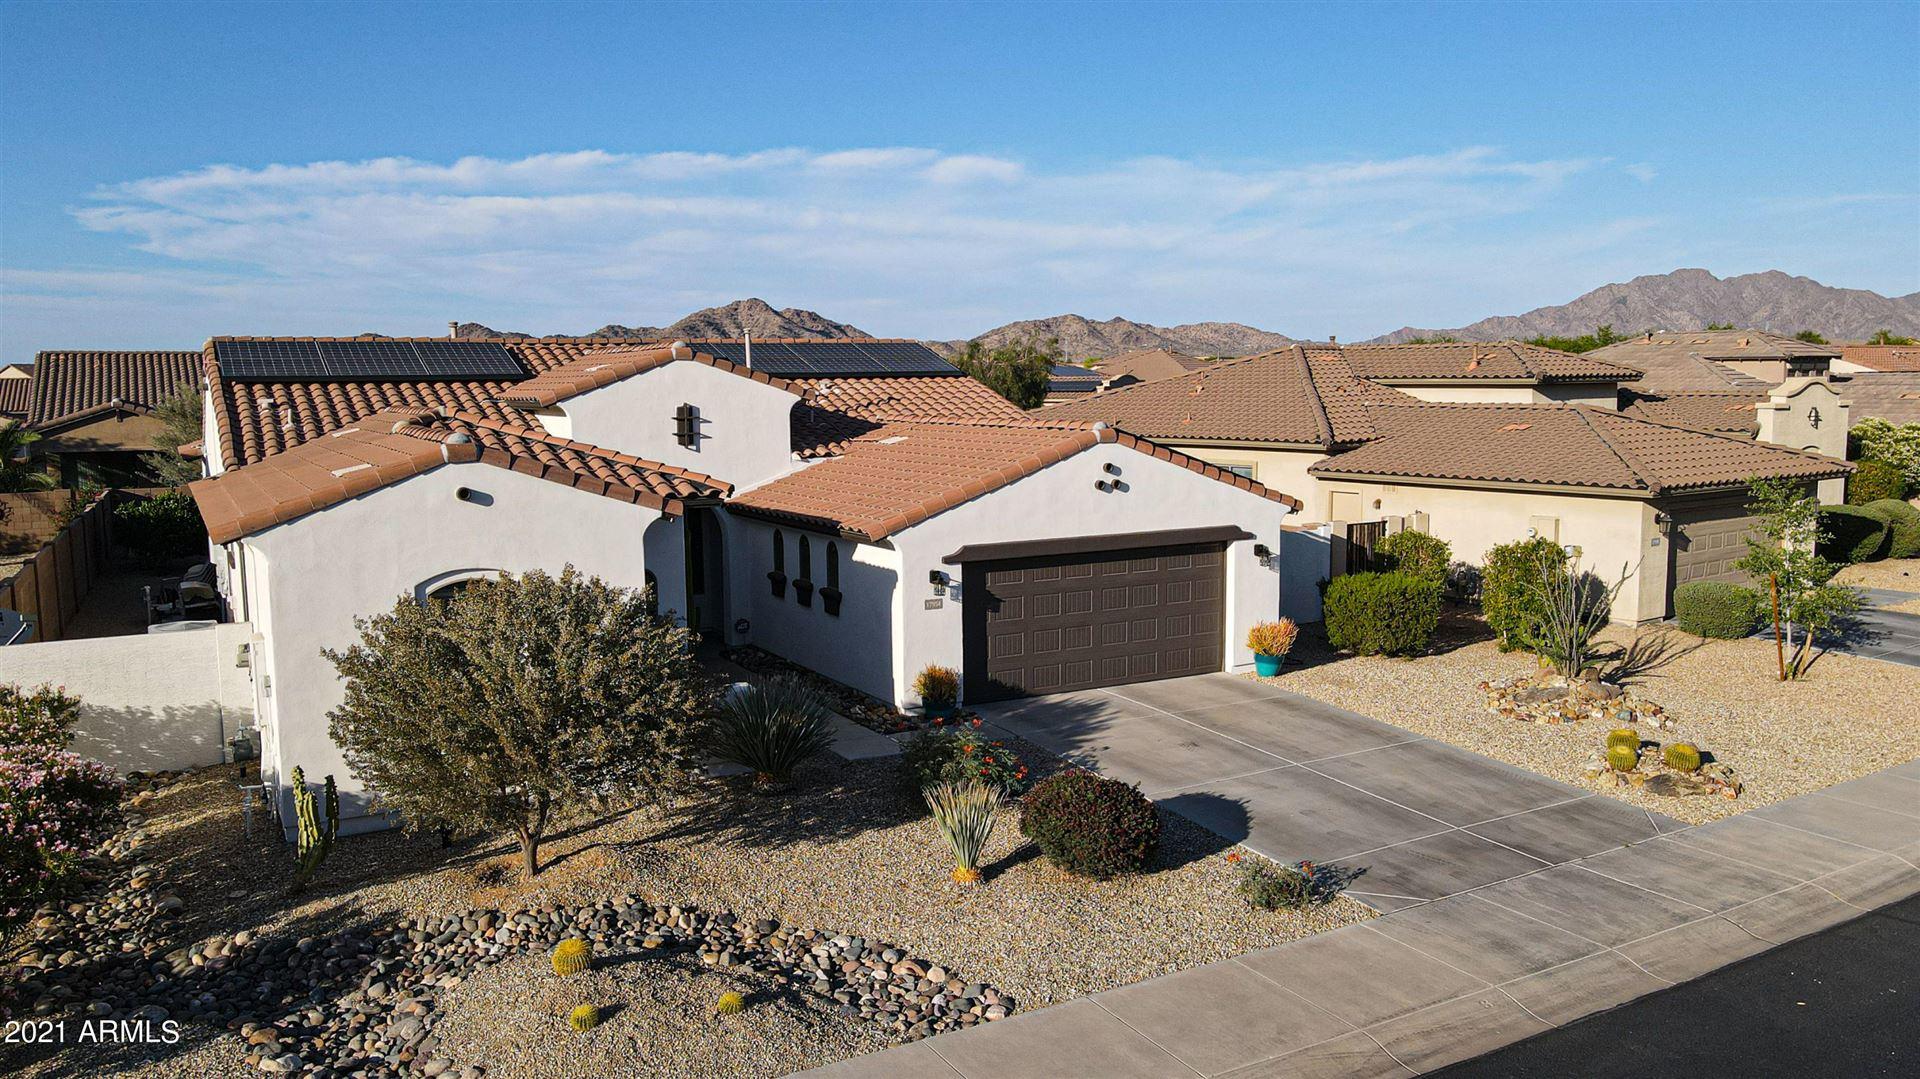 Photo of 17954 W VERDIN Road, Goodyear, AZ 85338 (MLS # 6231753)